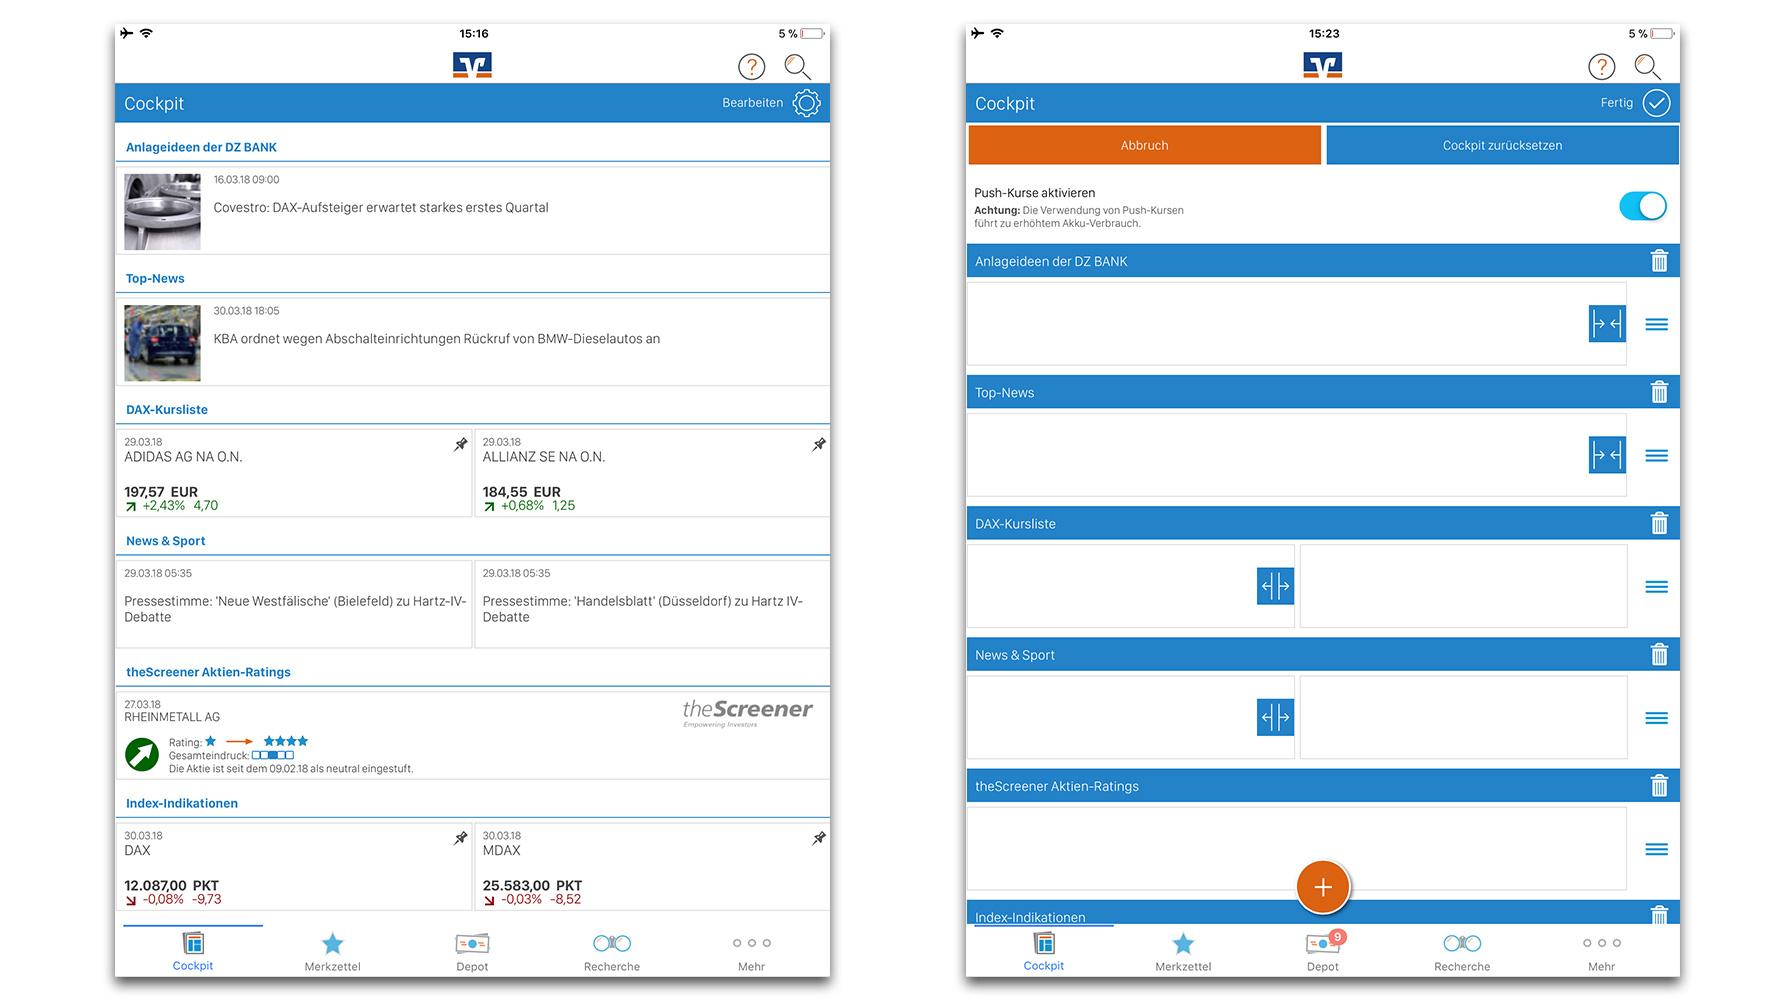 DepotPlus-Screens-1-iPadBlog.de